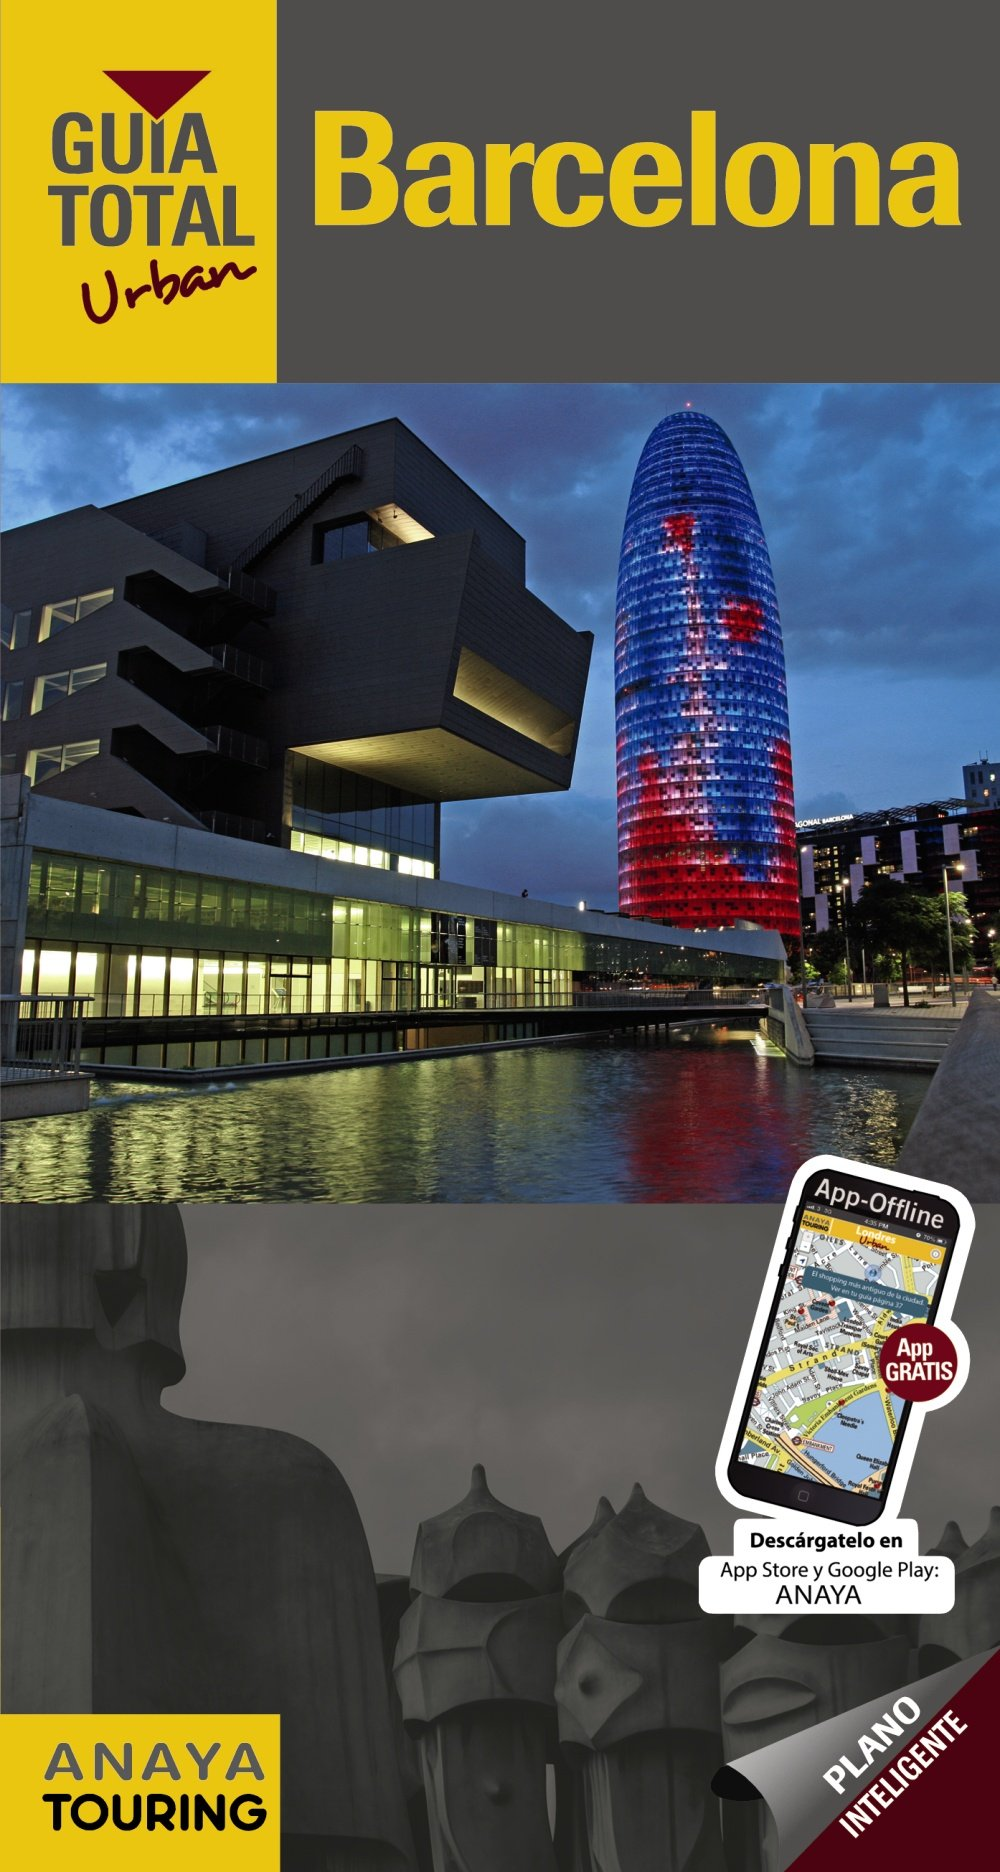 Barcelona (Urban) (Guía Total - Urban - España): Amazon.es: Anaya Touring, Martínez i Edo, Xavier: Libros